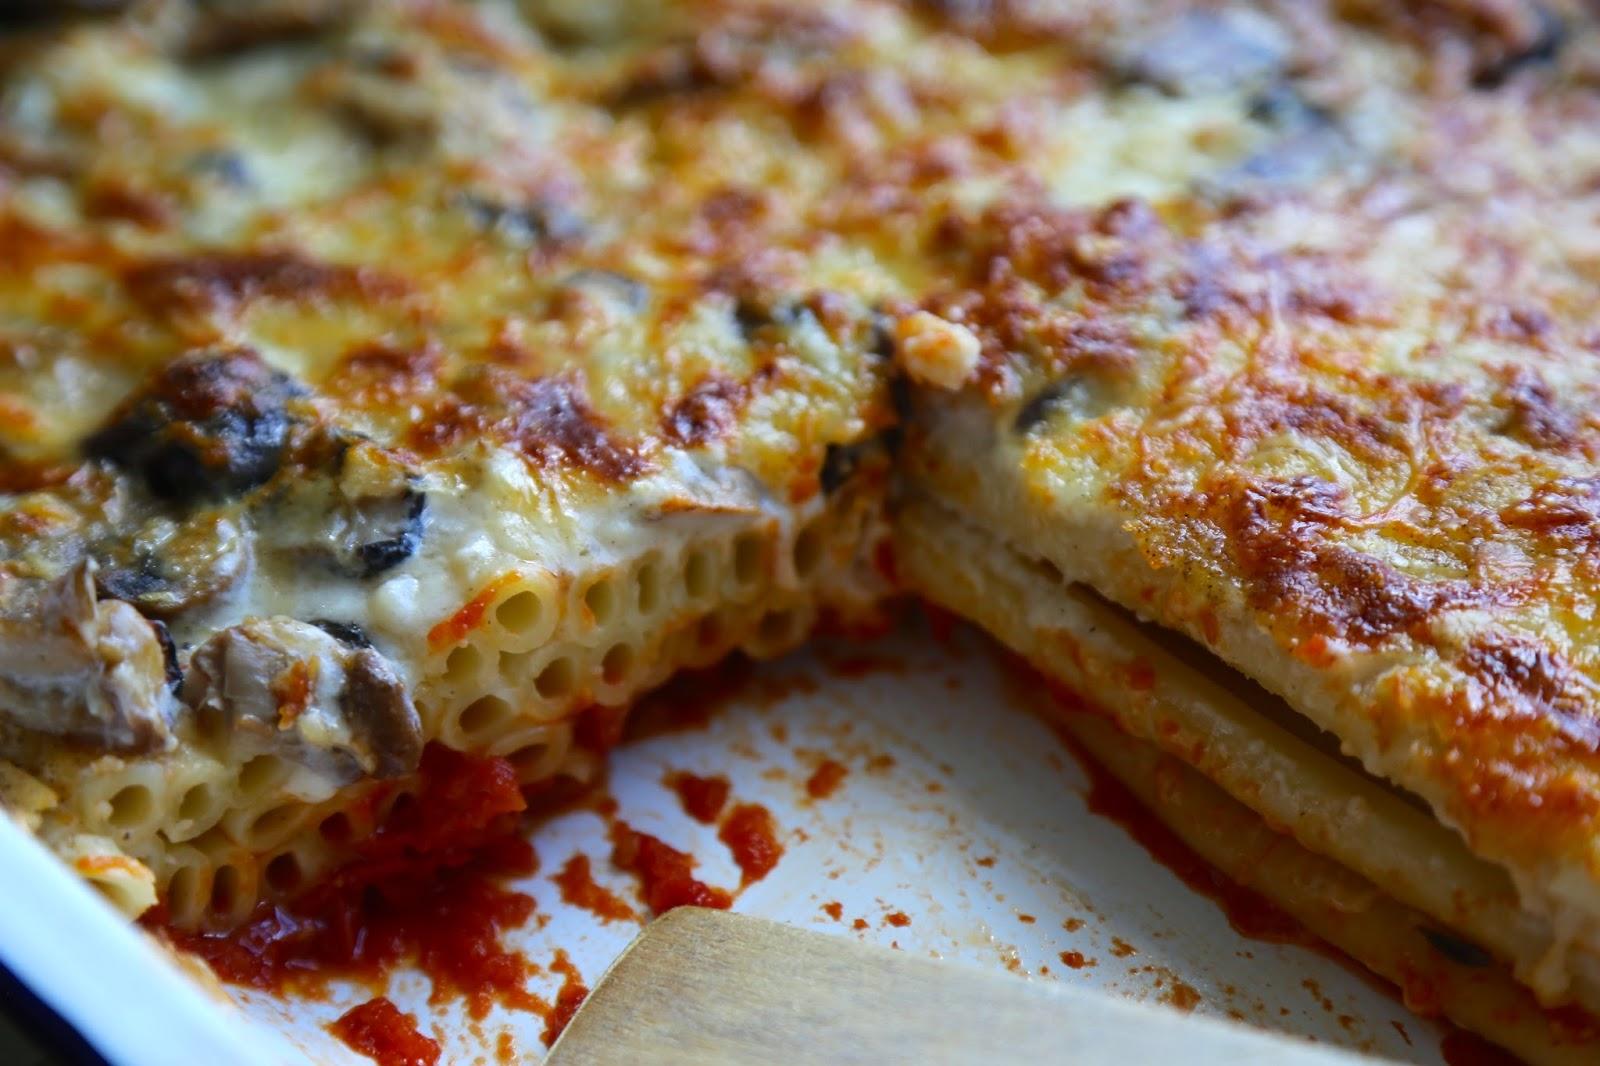 bake pastitsio greek pasta bake greek pasta bake pastitsio baked pasta ...